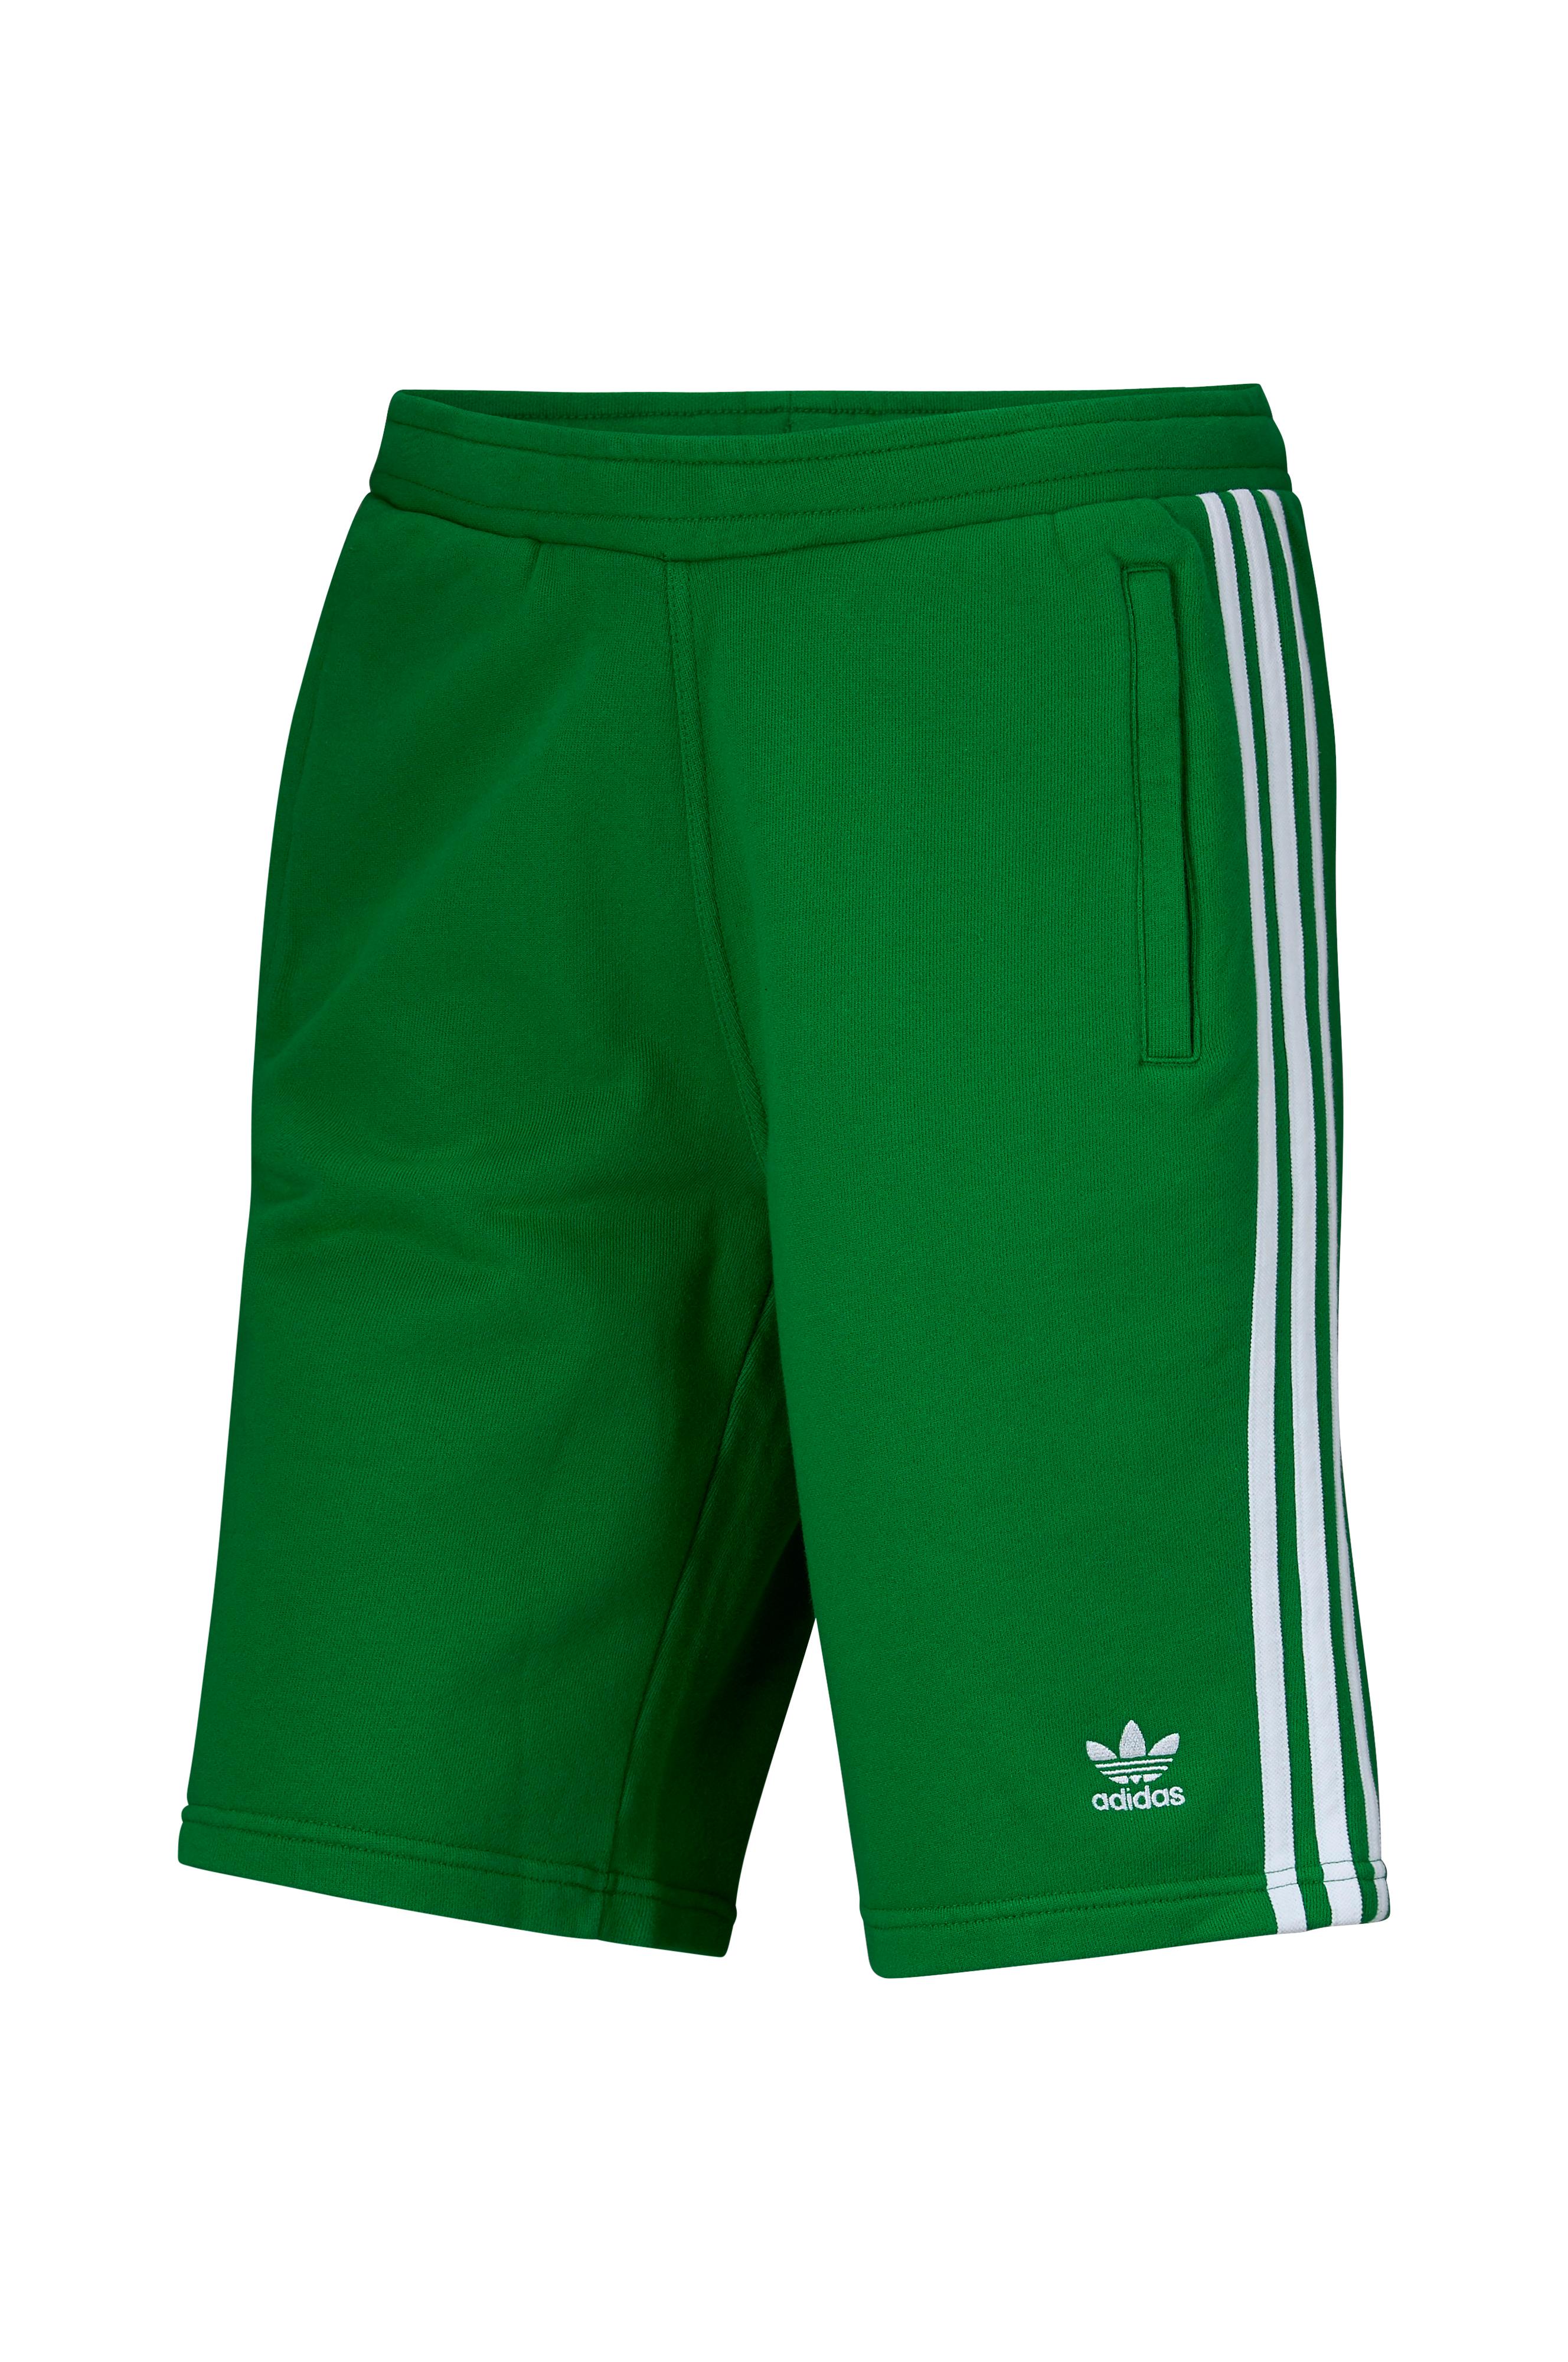 quality design 7587c db80b adidas Originals Shortsit, joissa 3-stripes-raidat - Vihreä - Miehet -  Ellos.fi